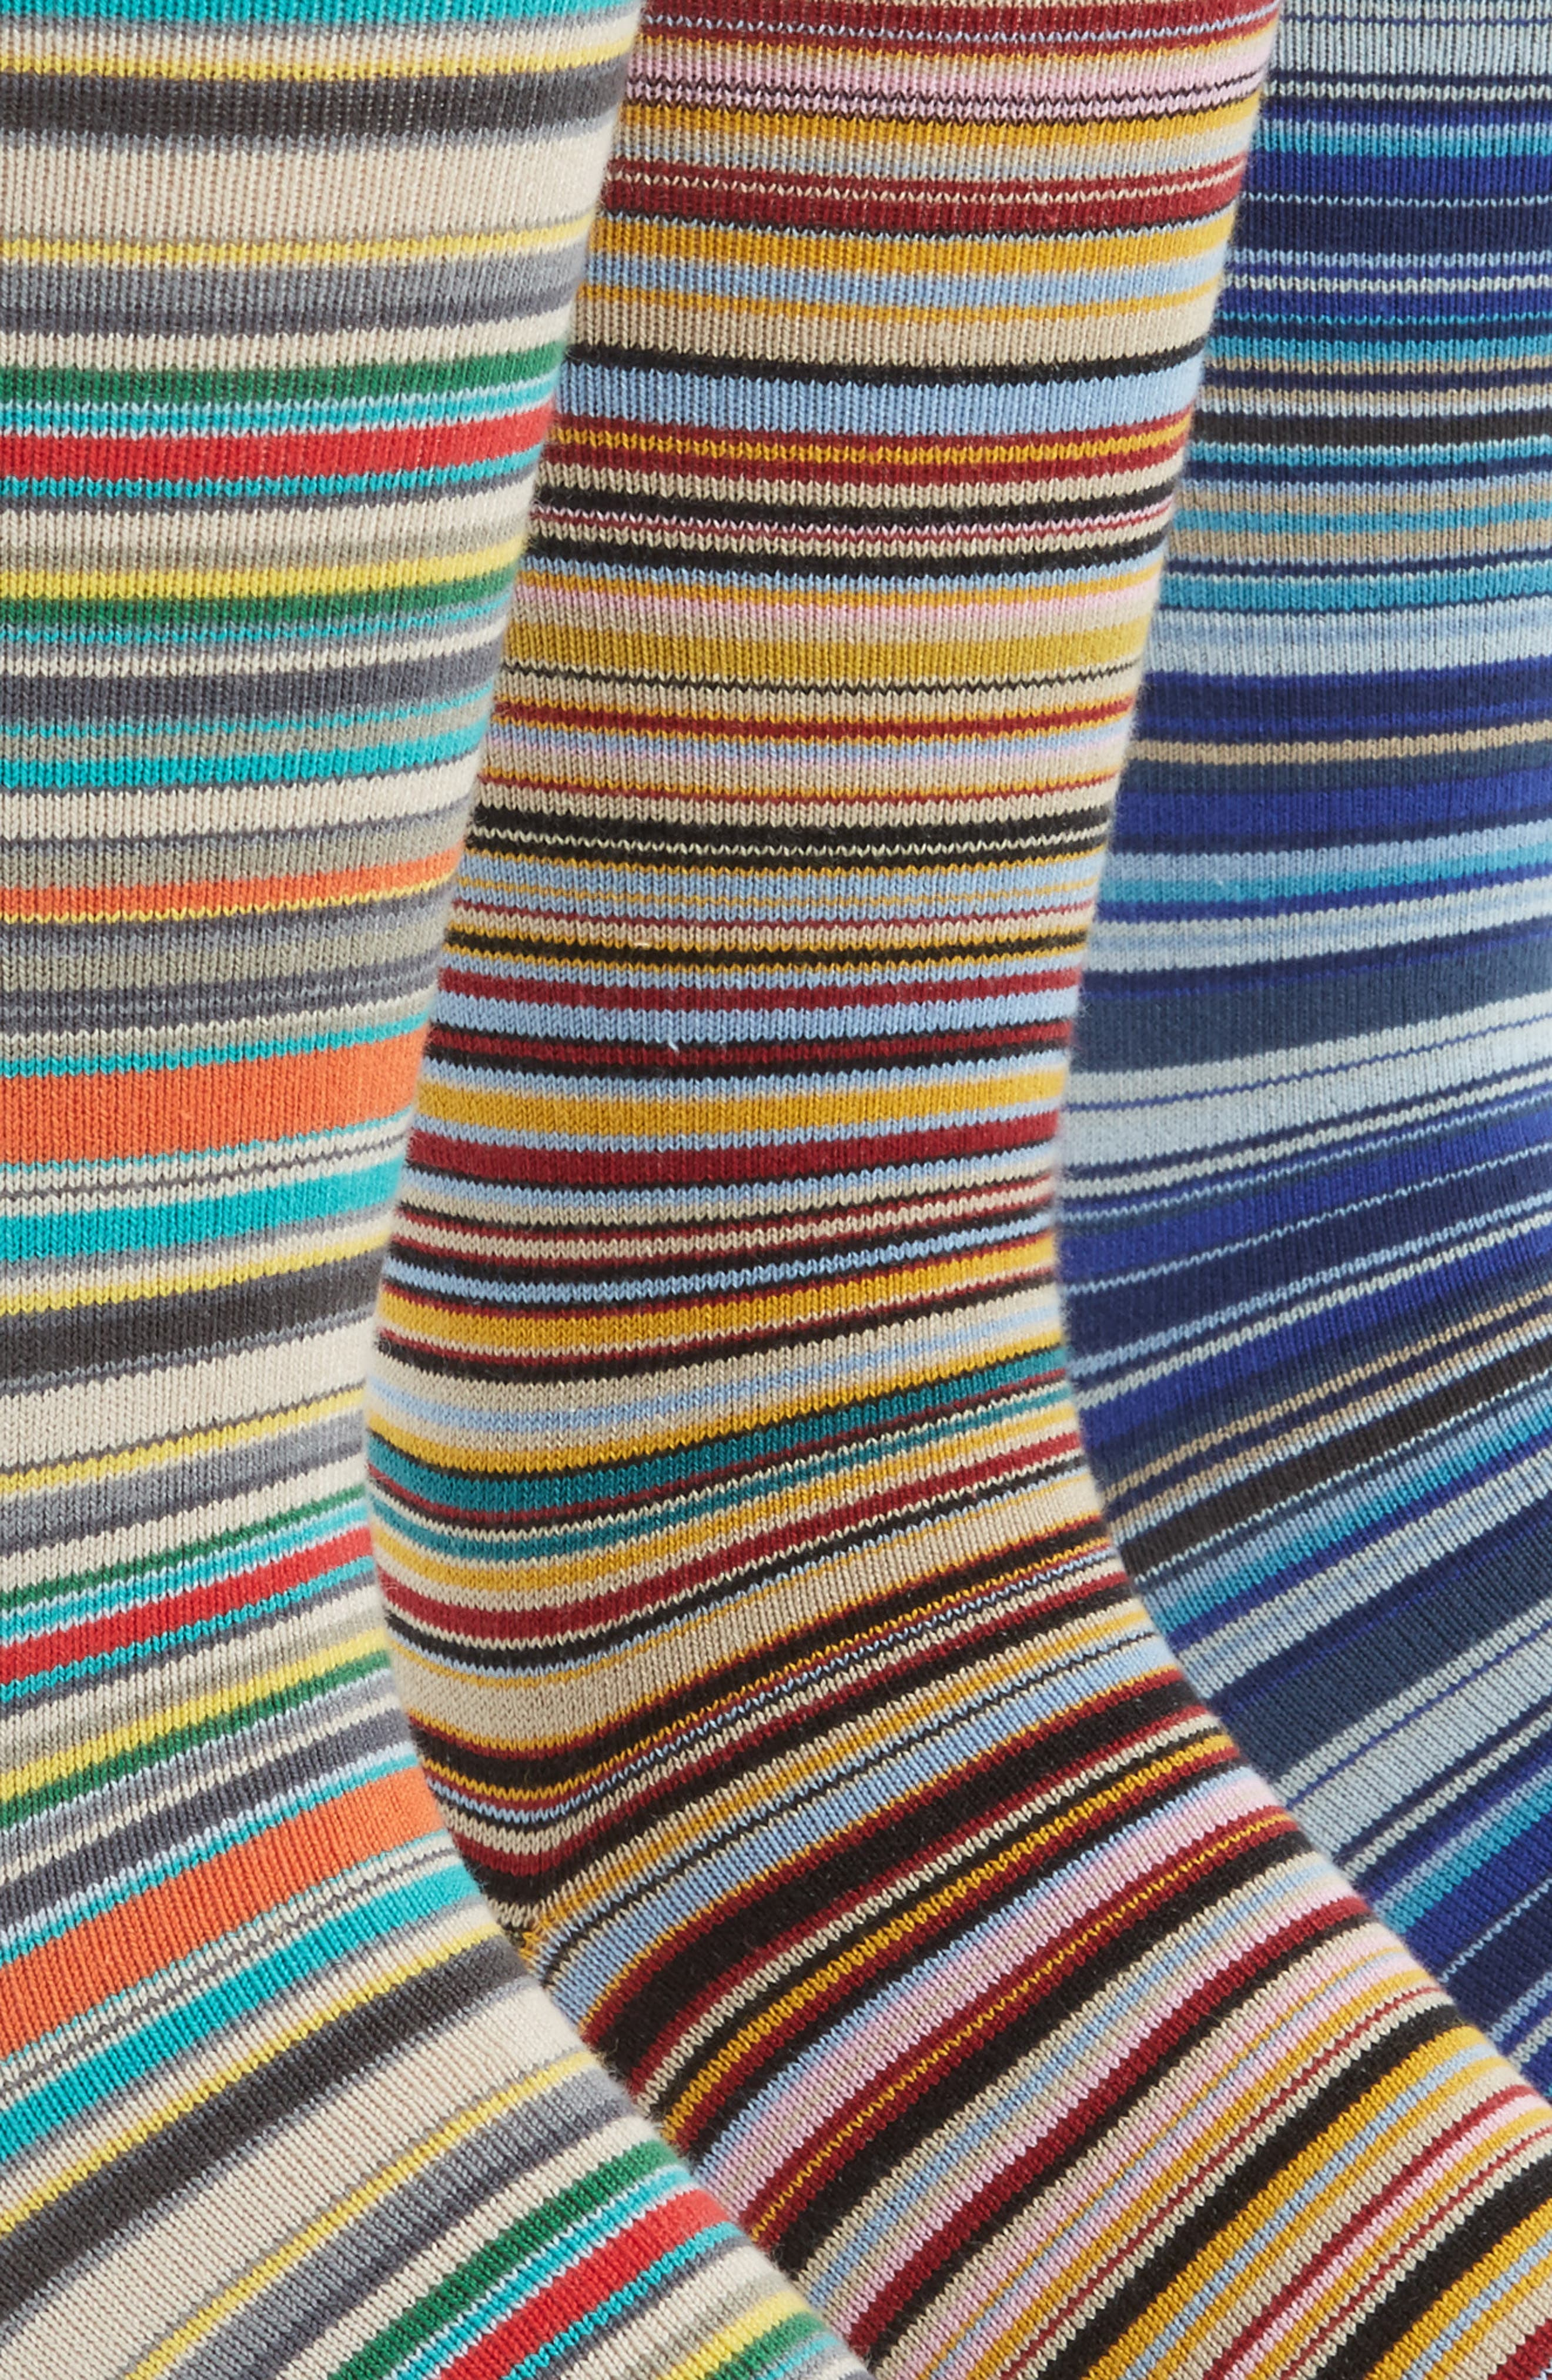 Alternate Image 3  - Paul Smith 3-Pack Mixed Pattern Socks ($90 Value)